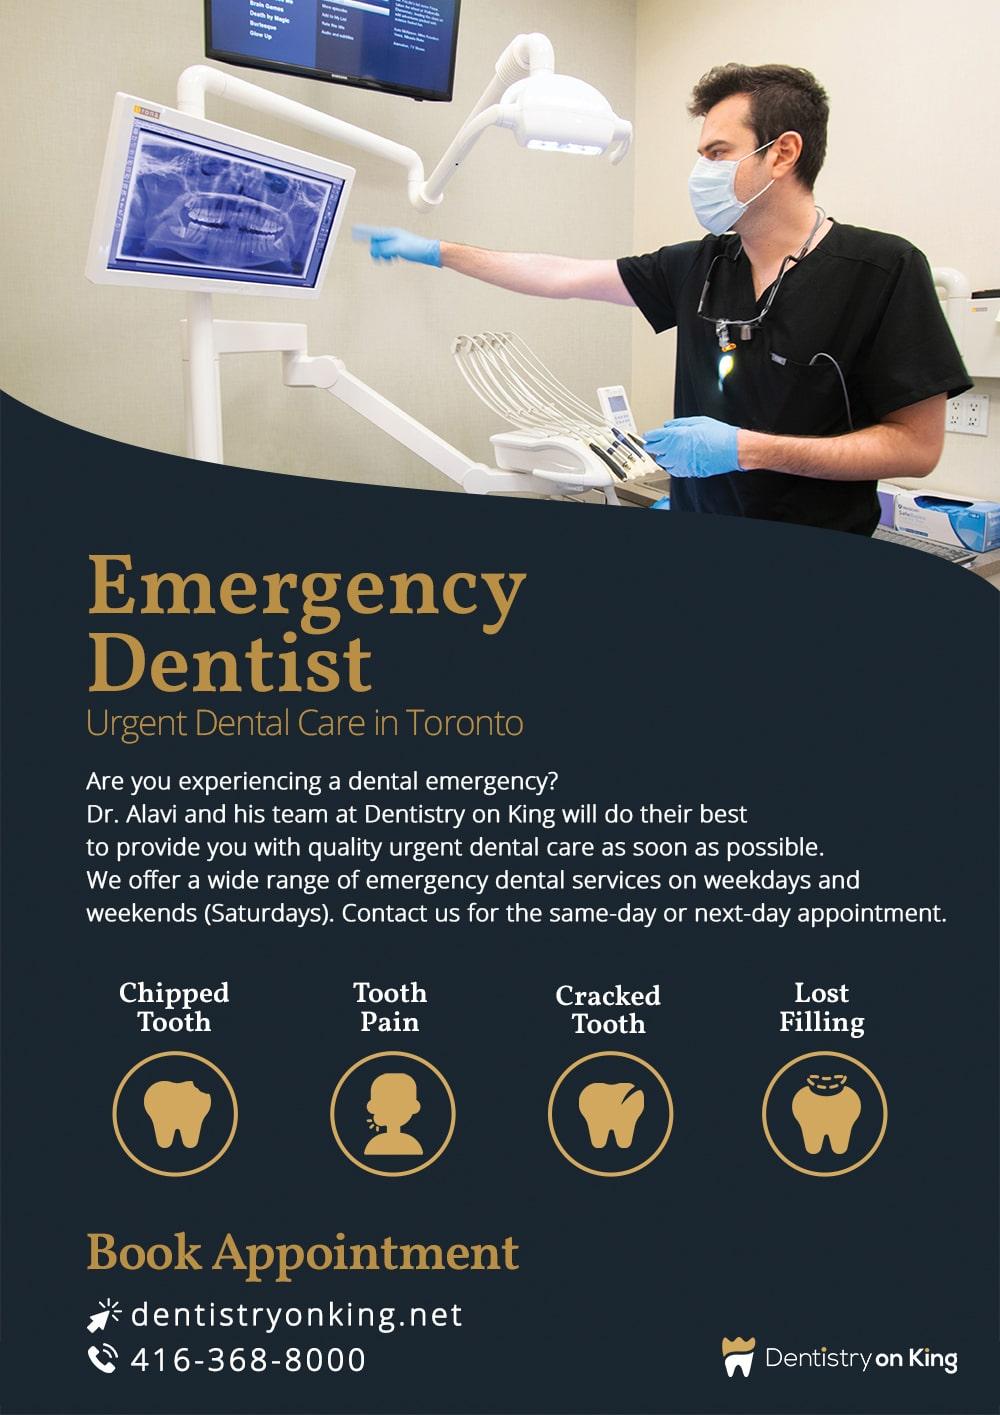 Emergency Dentist in Toronto, Dr. Mahan Alavi of Dentistry on King